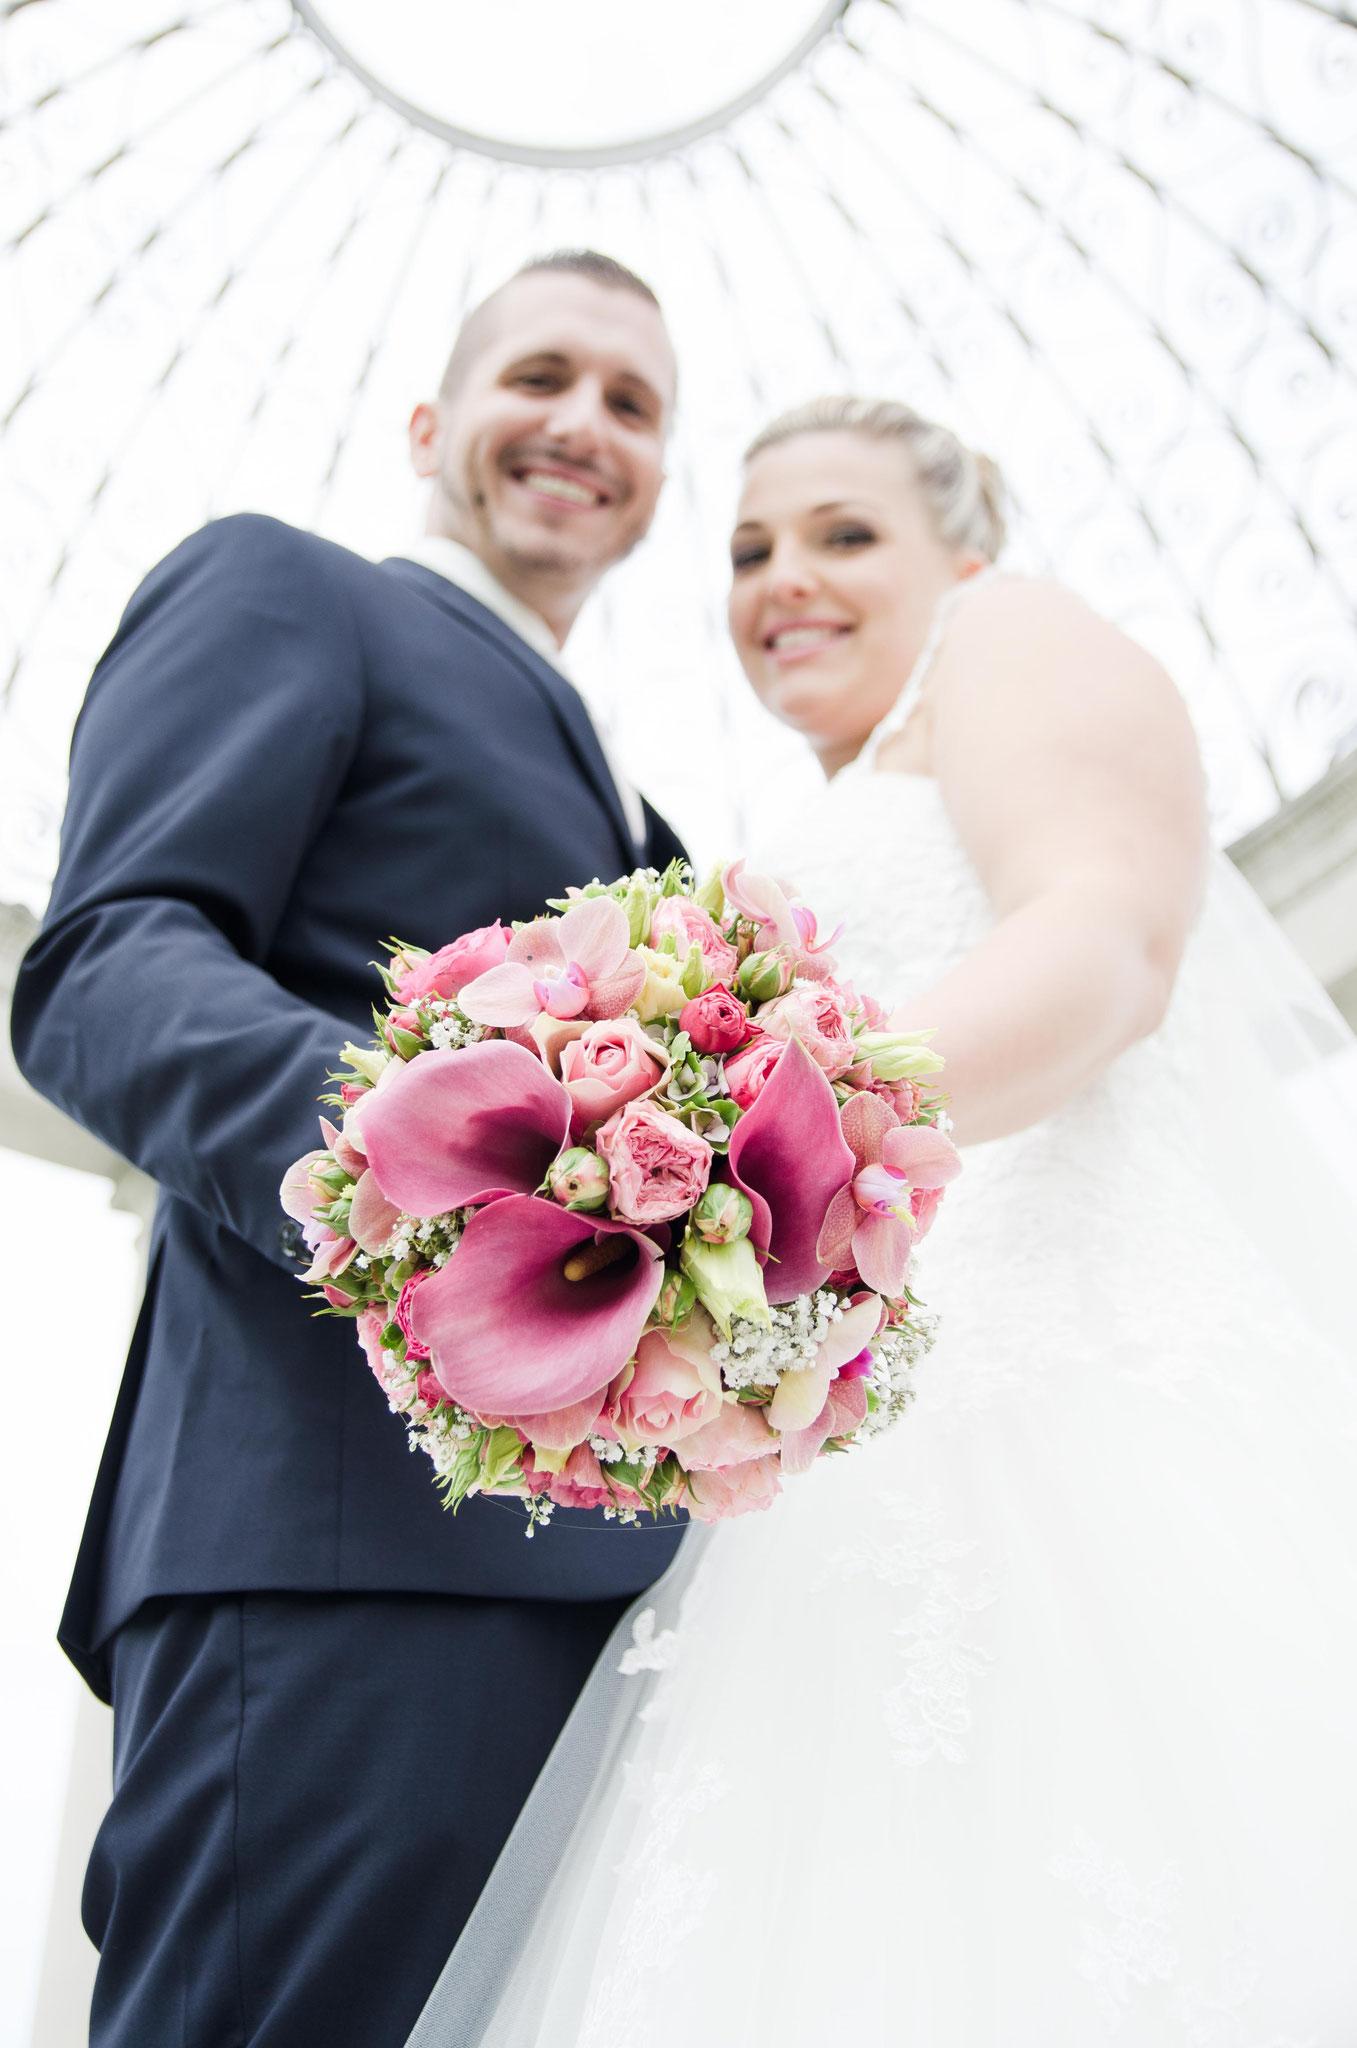 Hochzeitsfotograf in Ortenau Daniel Keller / Felix-Burda Park Paar mit Brautstrauß